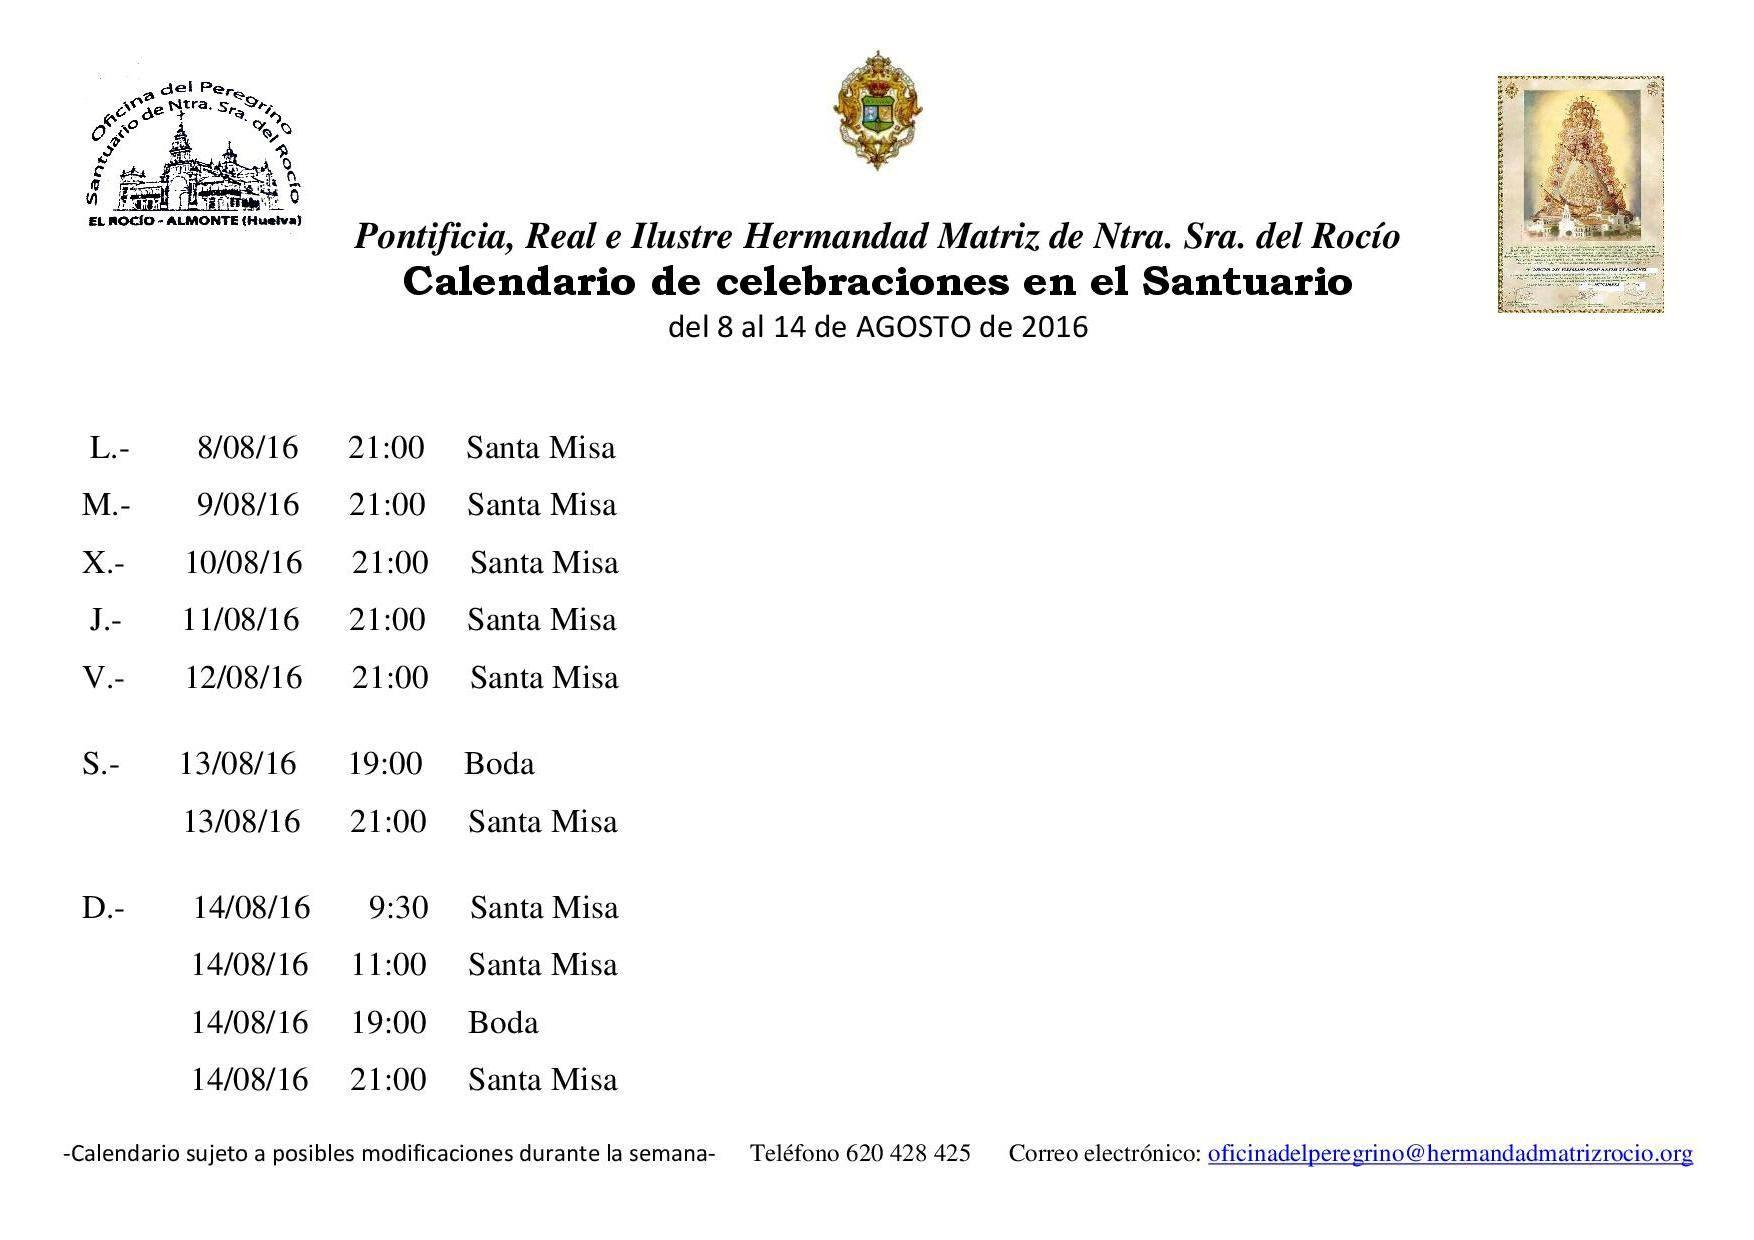 Calendario Santuario Rocio 8 al 14 de 8 de 2016